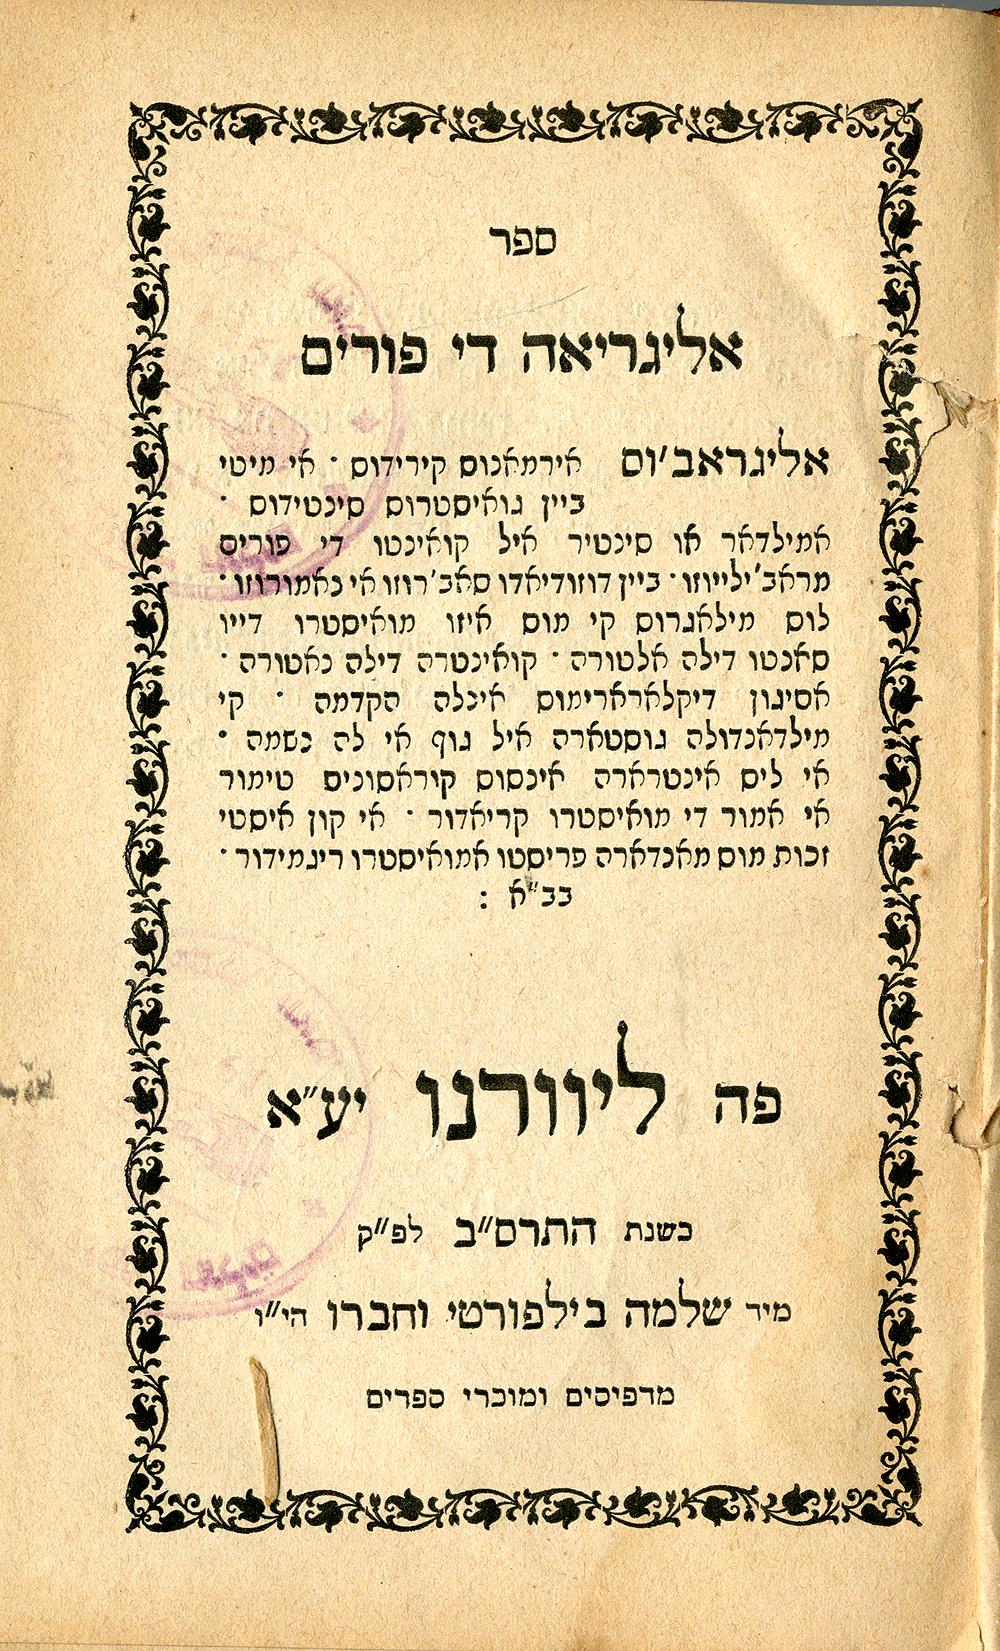 Title page, Sefer Alegria de Purim, published in Livorno in 1902 by Solomon Belforte.